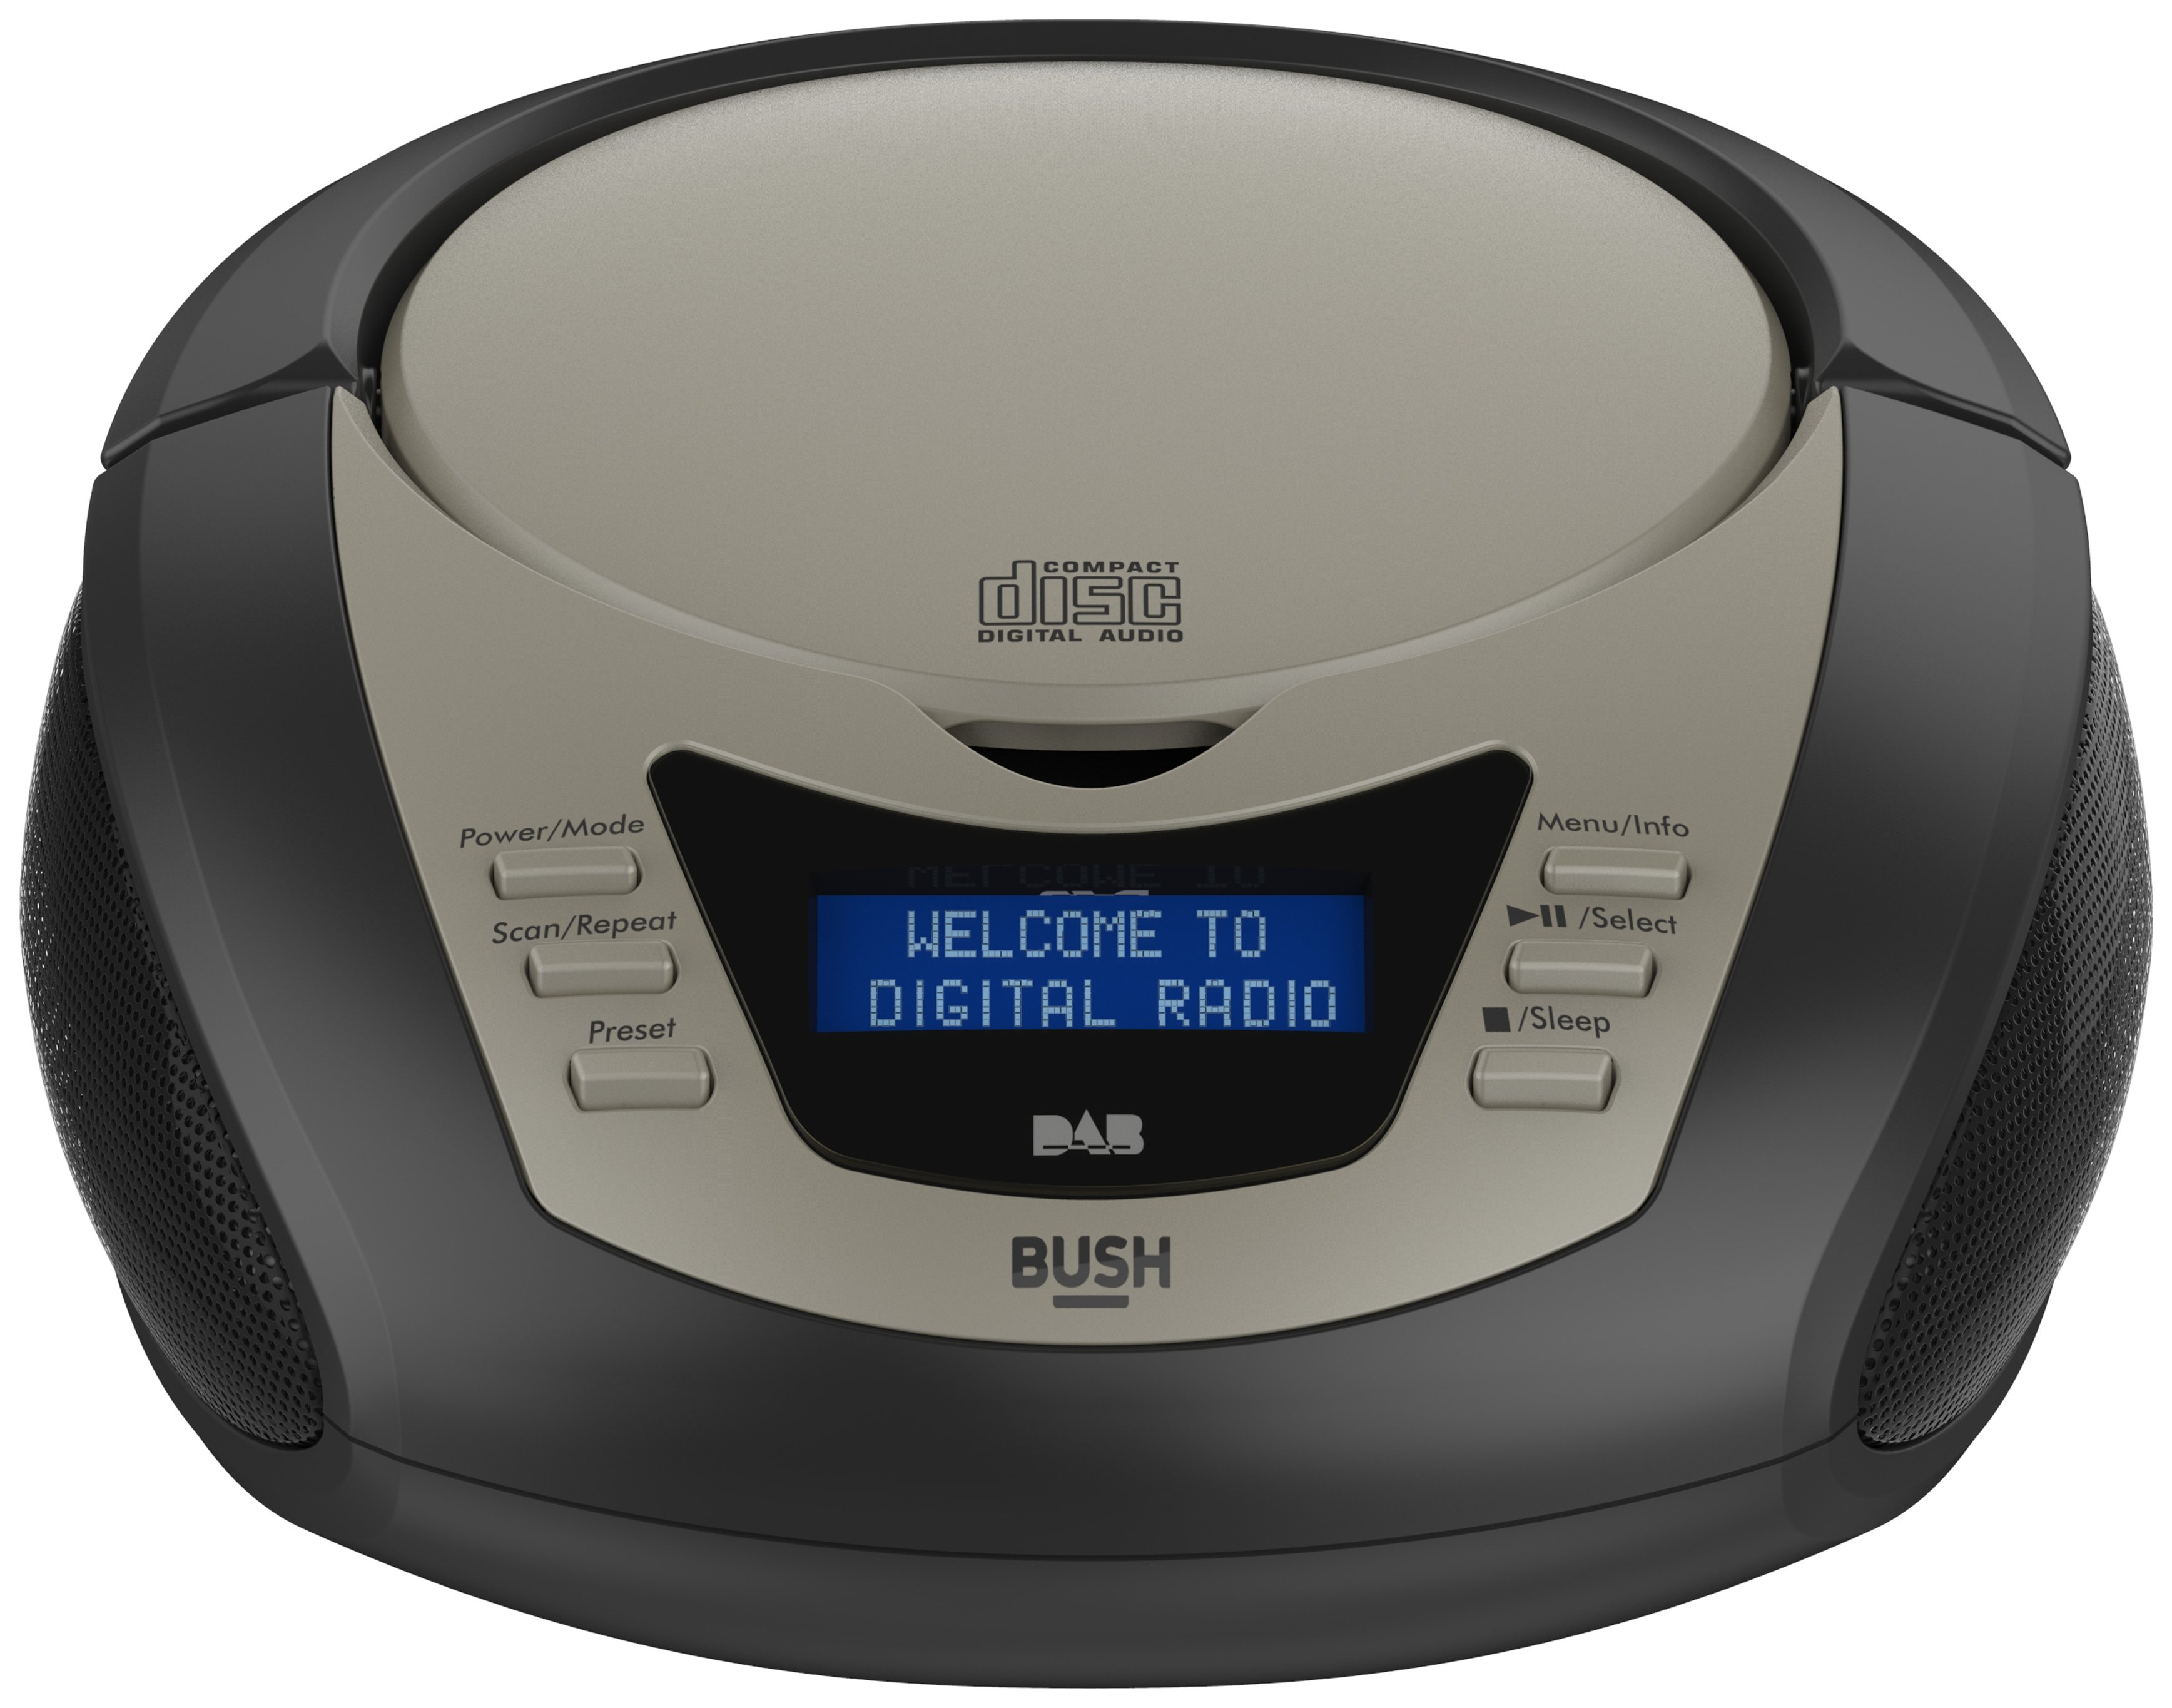 Bush DAB Boombox with CD Player - Black